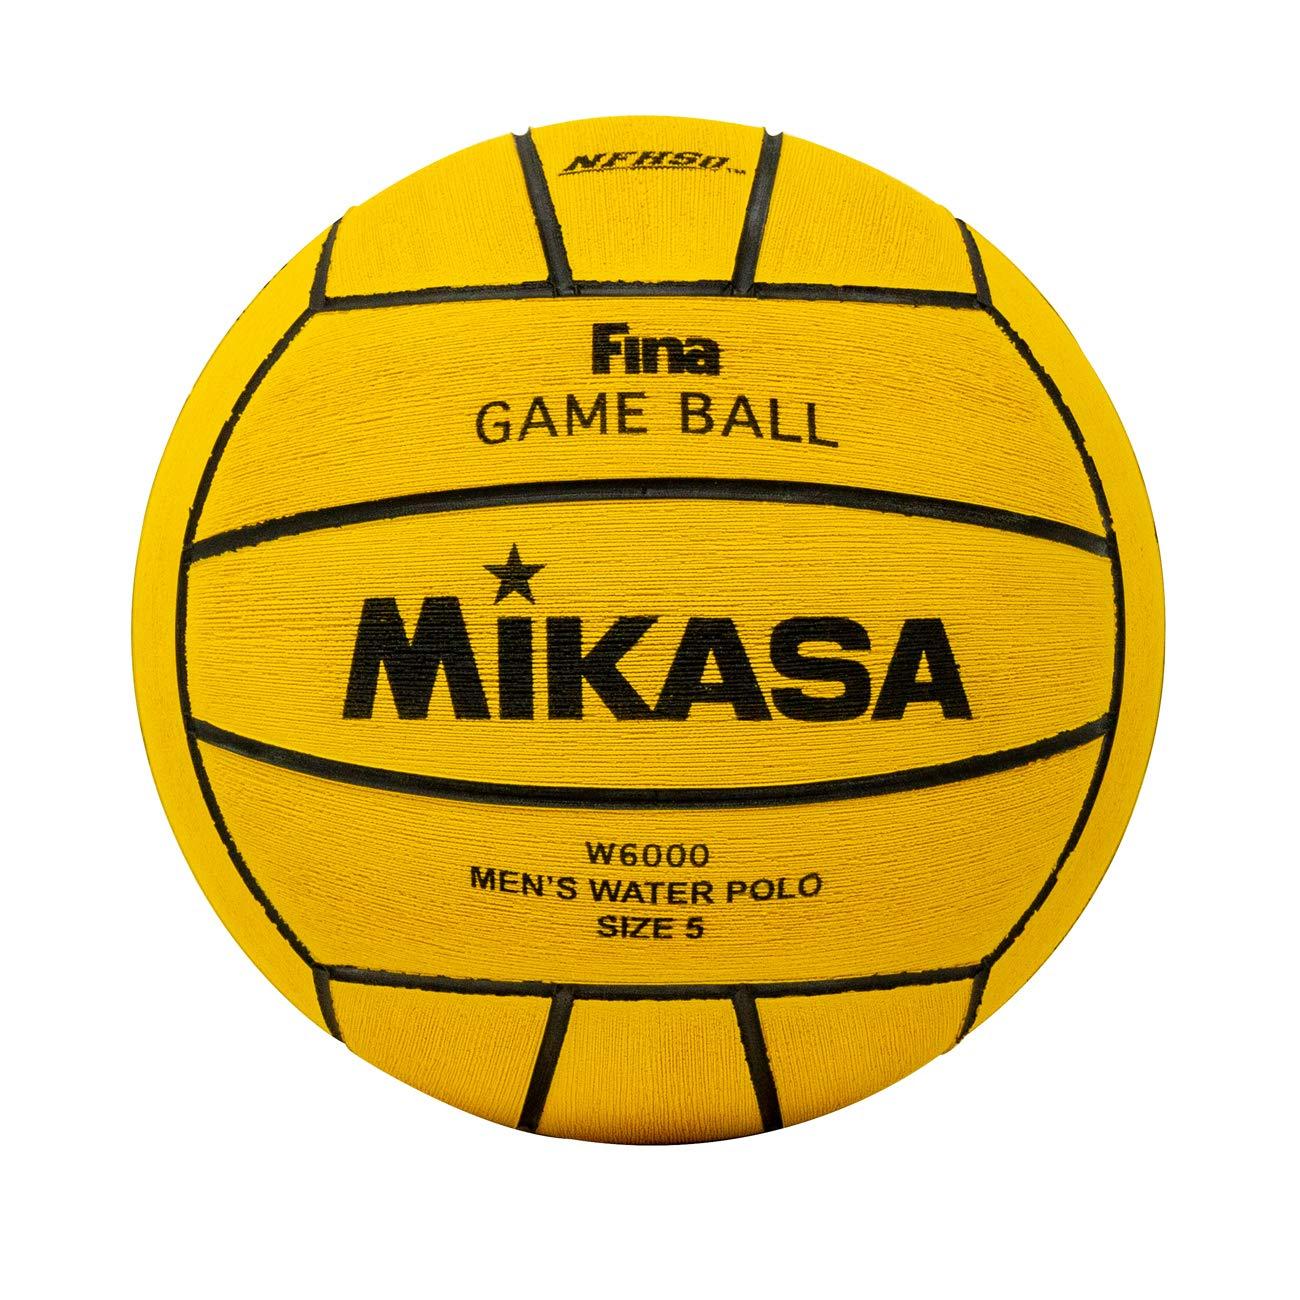 B00006JK2H Mikasa W6000 NCAA Men's Water Polo Ball 71c4l2X4LmL